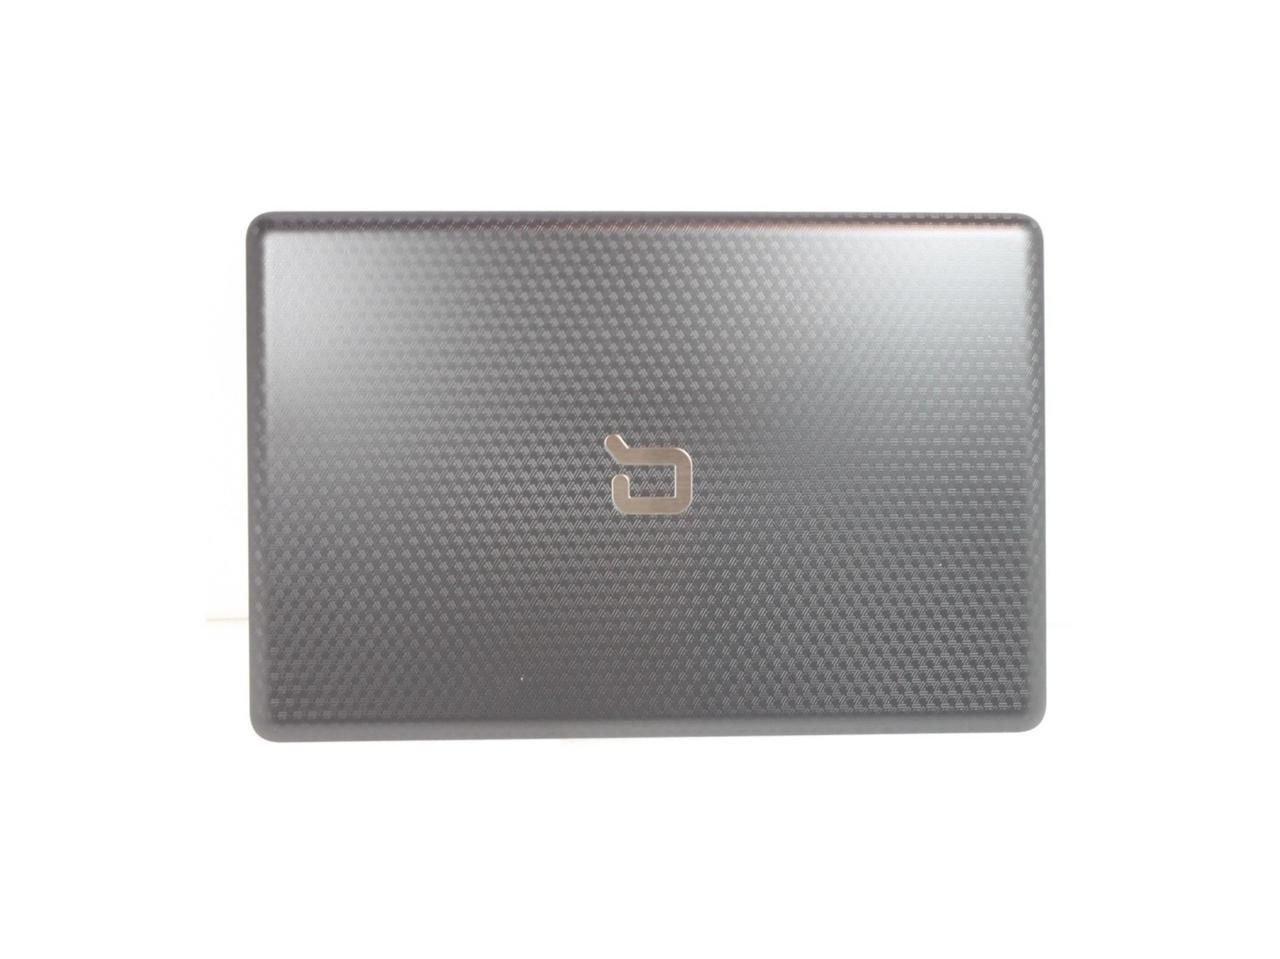 New Original HP Compaq Presario CQ62 15.6inch Laptop LCD Back Cover 602824-001